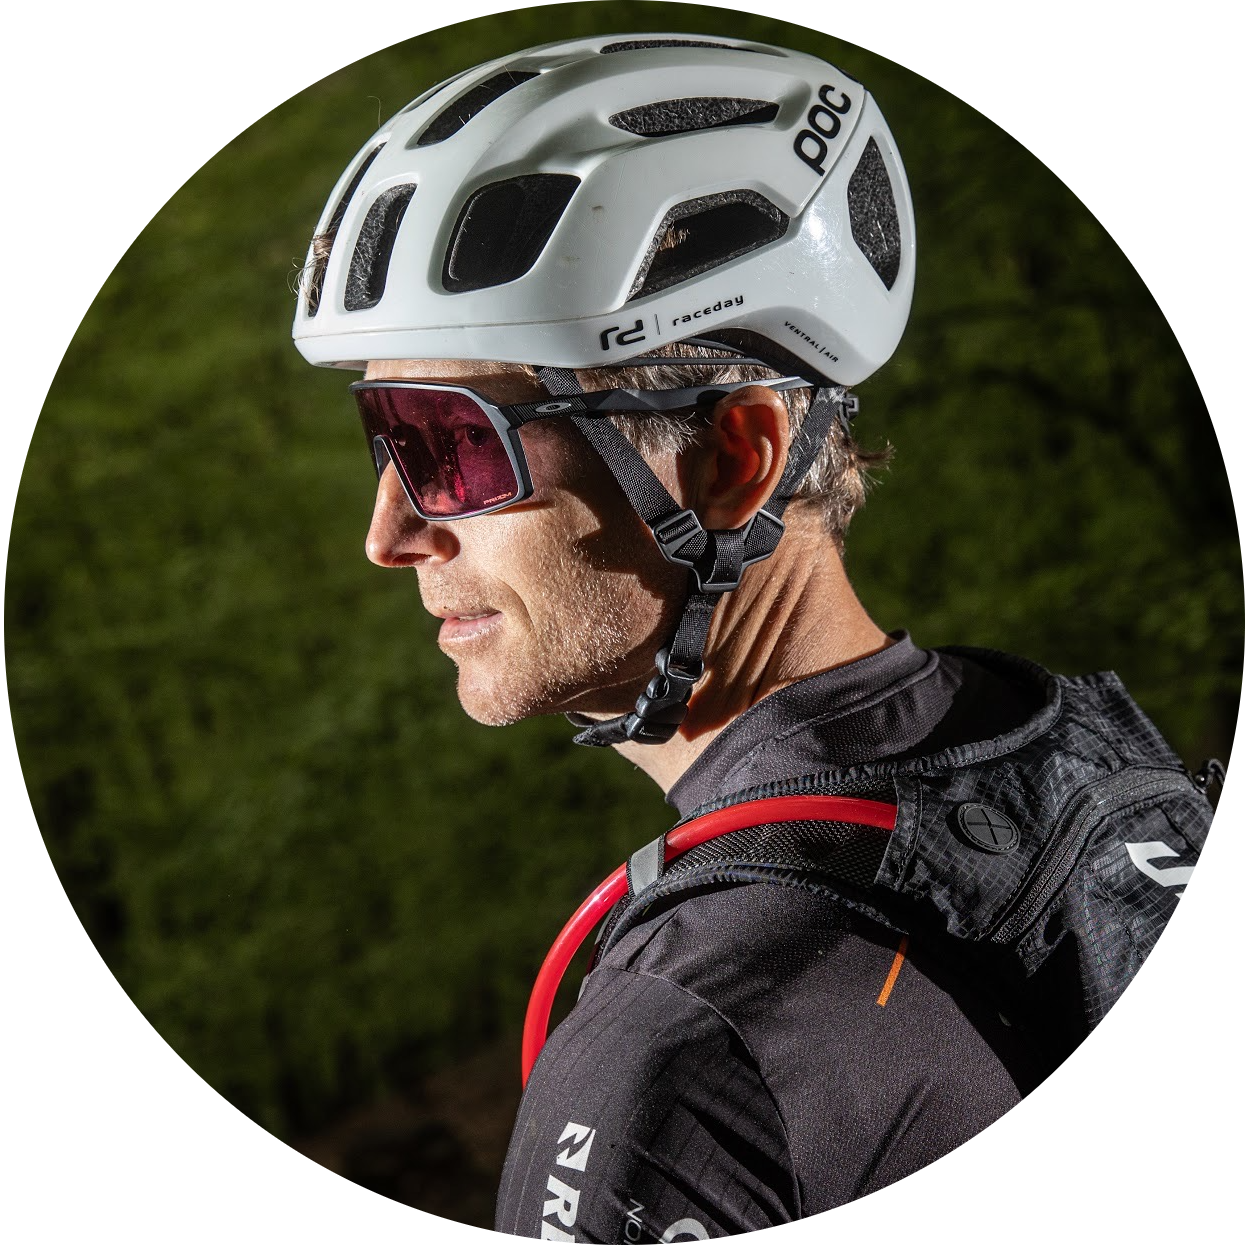 Future-Cycling-Team-2020_29